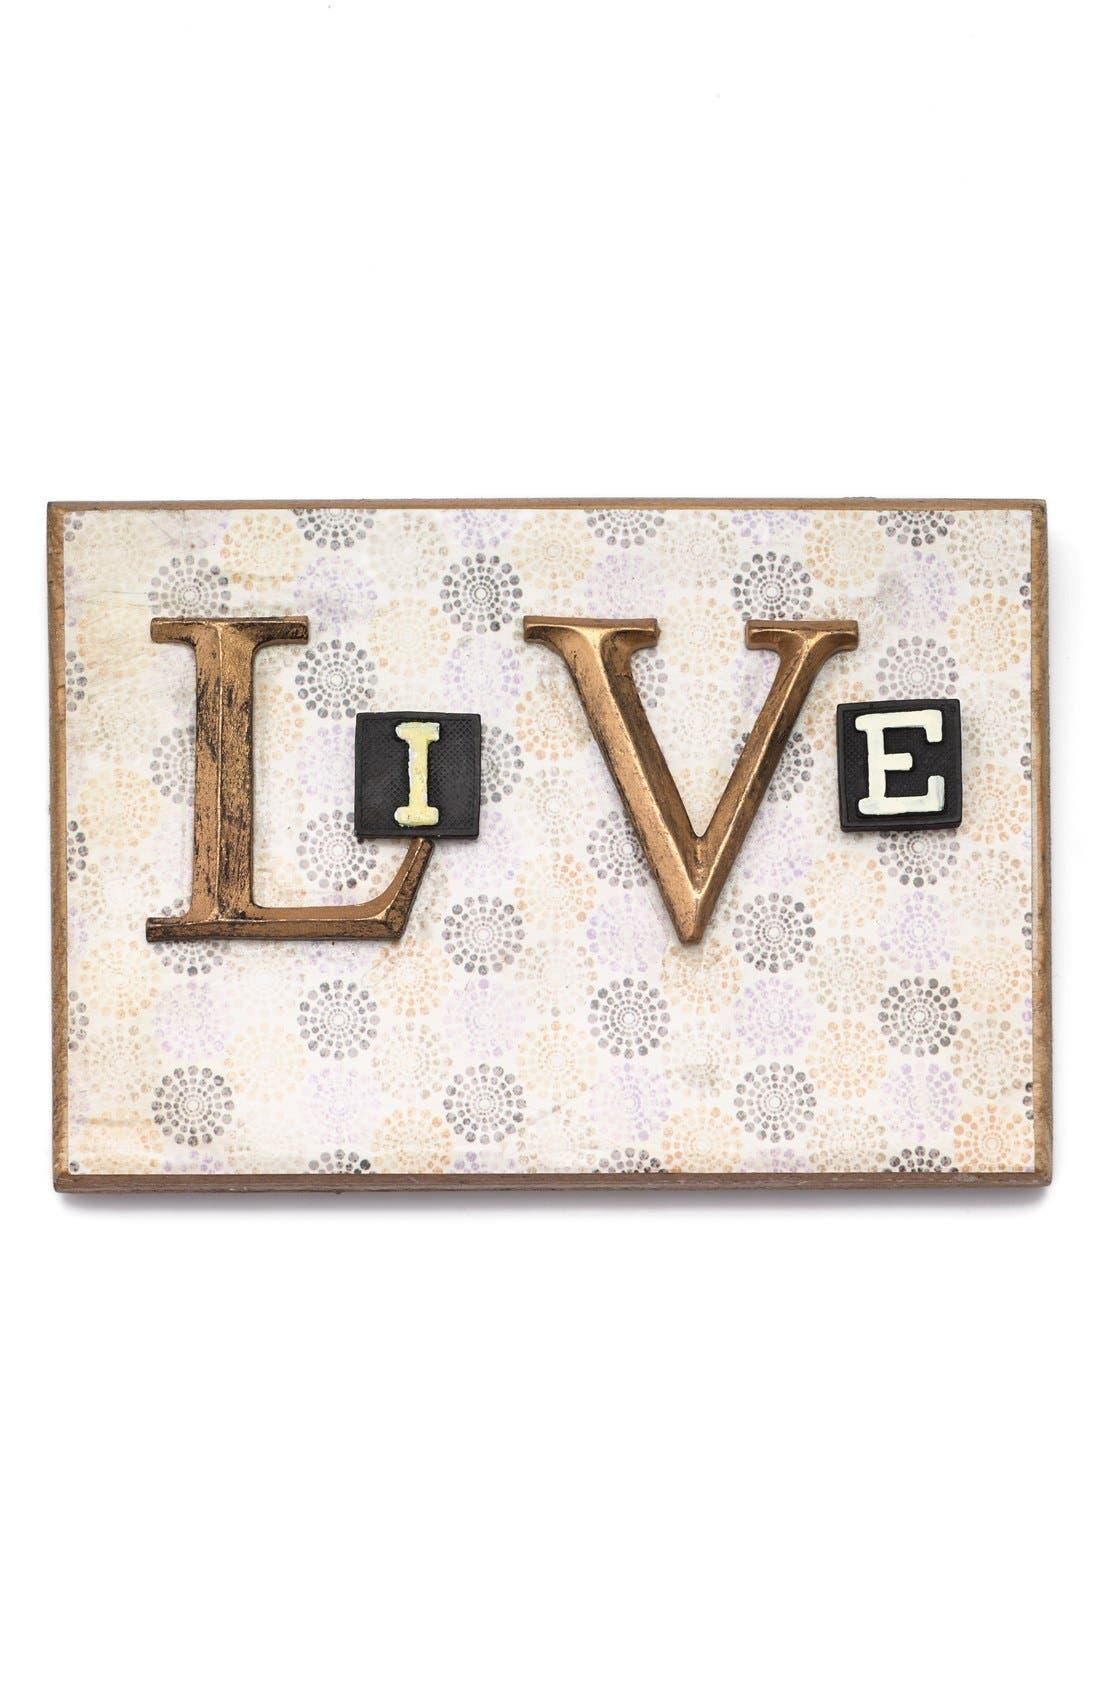 Alternate Image 1 Selected - Creative Co-Op 'Live' Embellished Wooden Wall Art